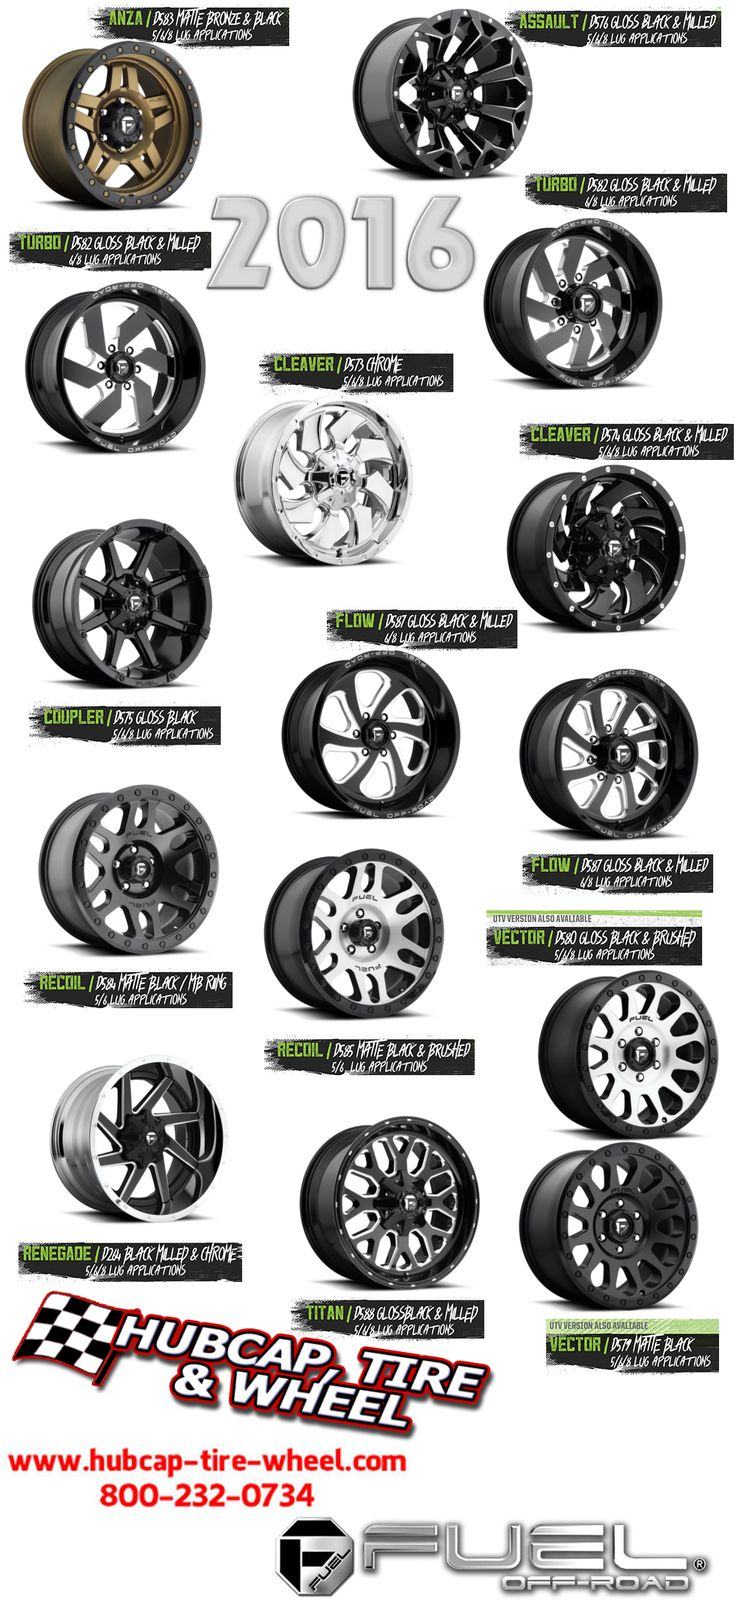 25 best off road wheels ideas on pinterest rims for trucks 4x4